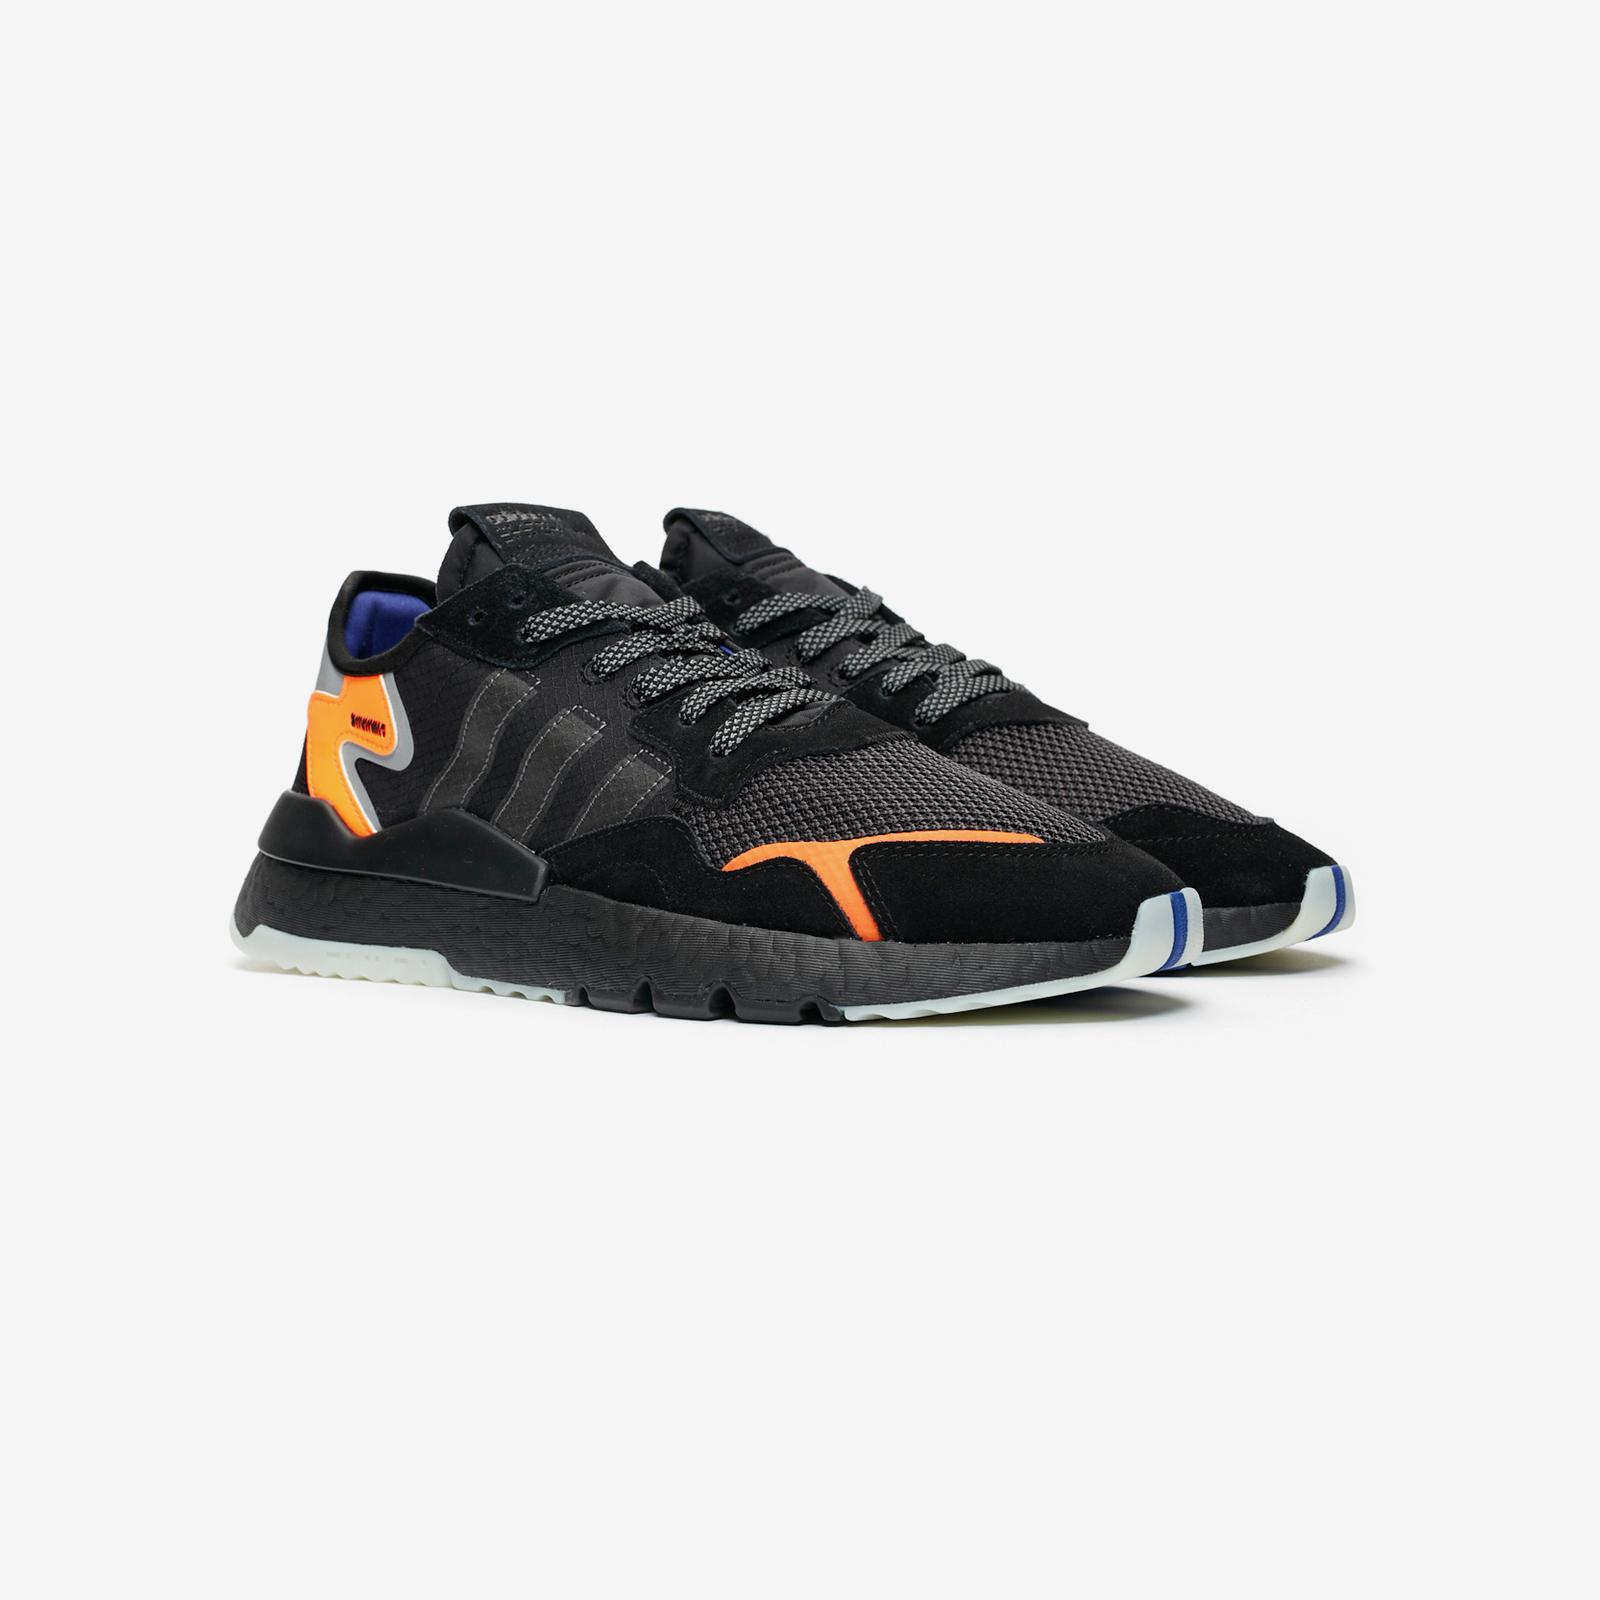 meet c2dc1 07bf4 adidas Originals Nite Jogger